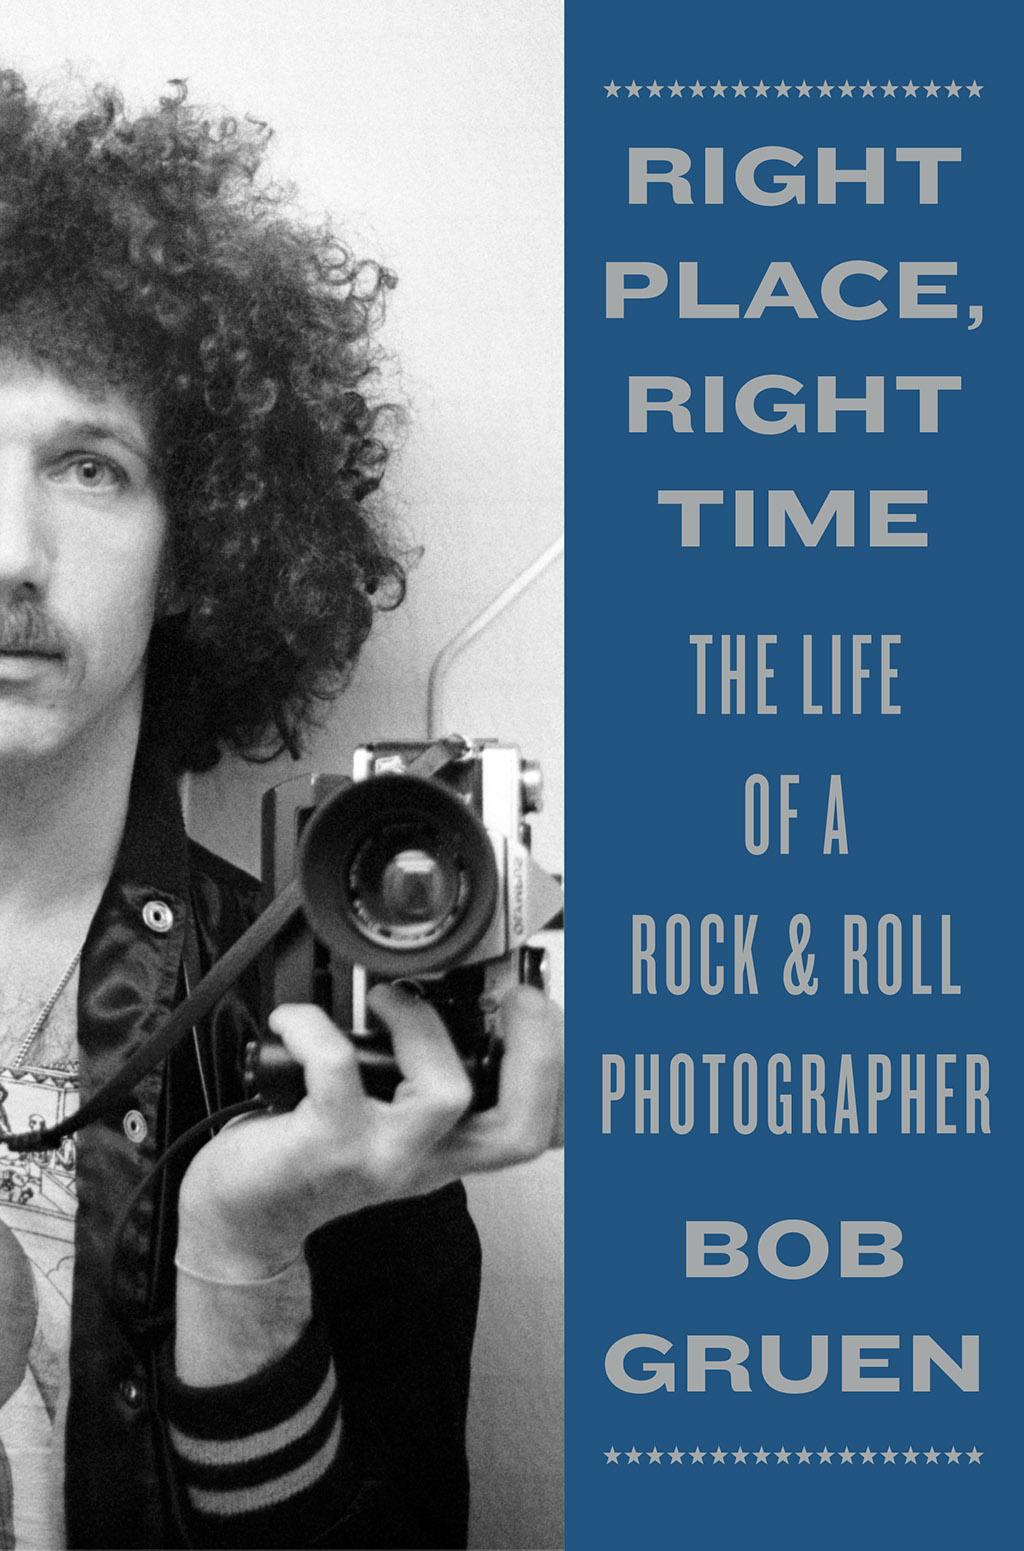 Bob Gruen Book Cover